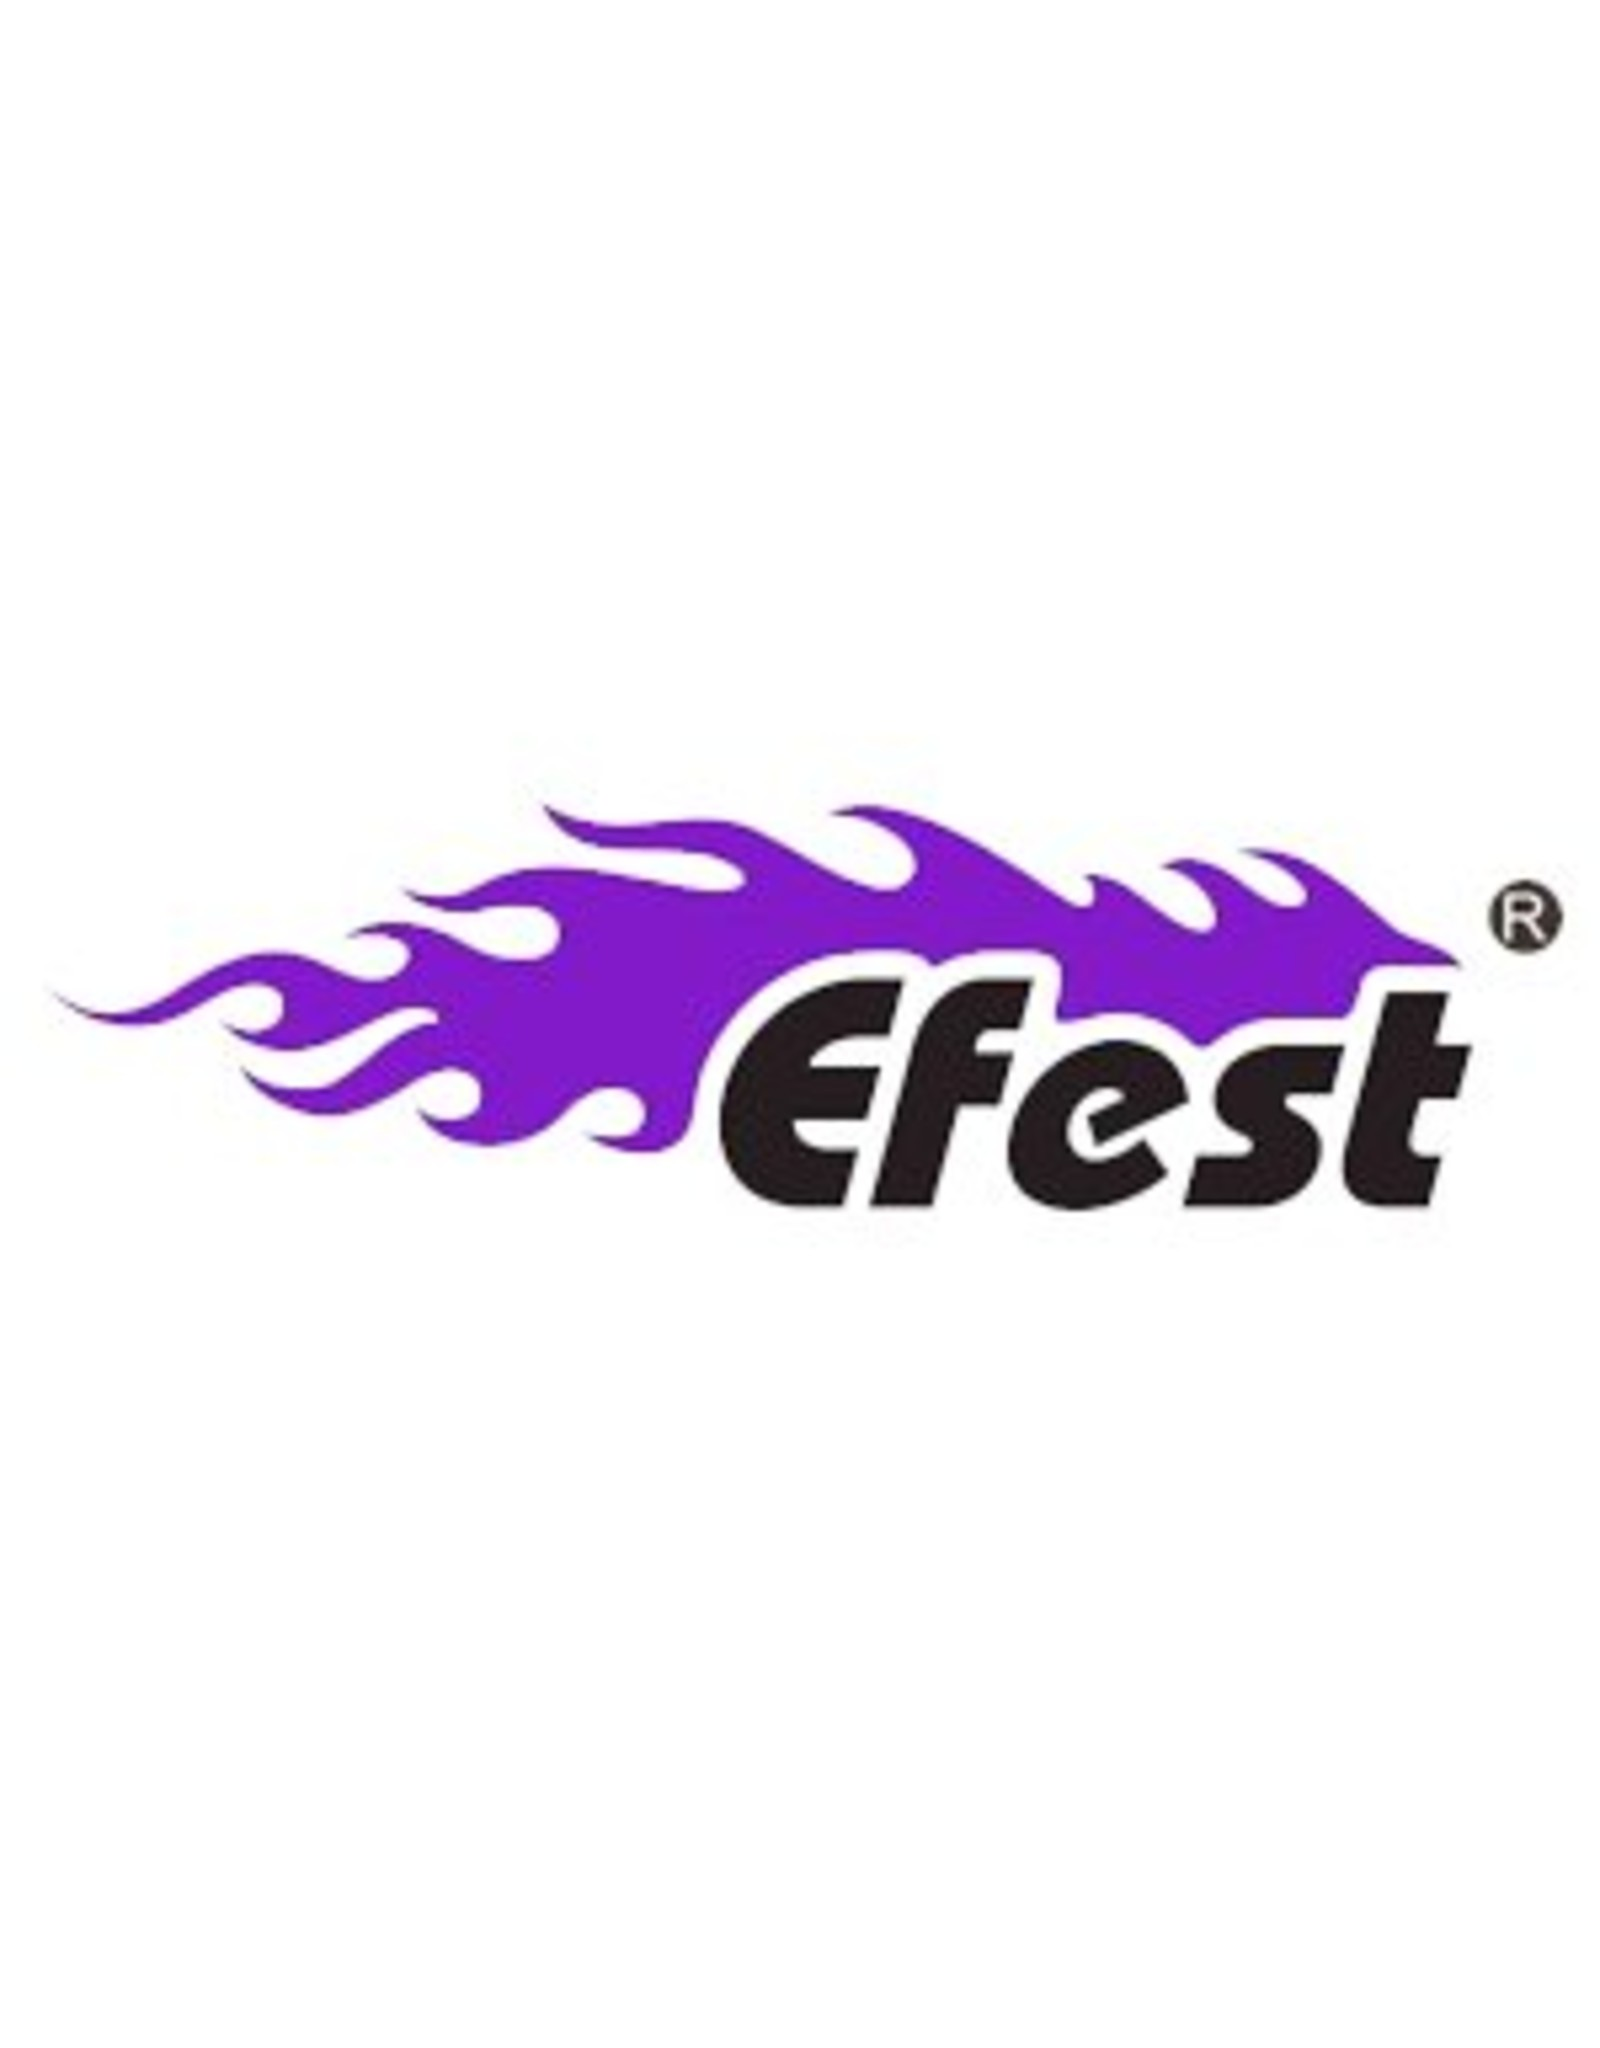 EFest Efest Chargers